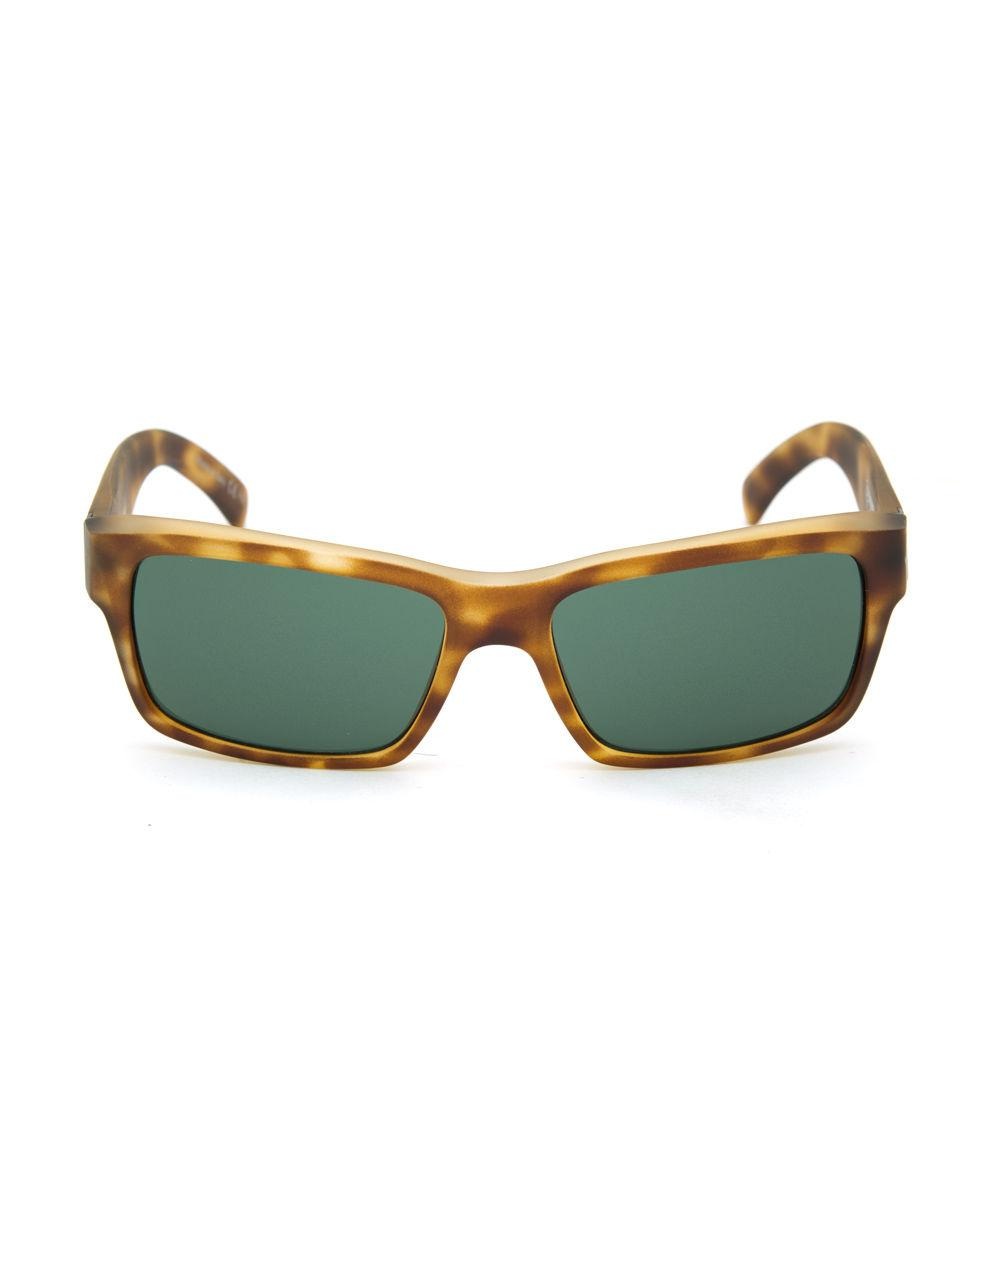 ab8229b9e2 Lyst - Von Zipper Fulton Tortoise Satin   Vintage Grey Sunglasses in Gray  for Men